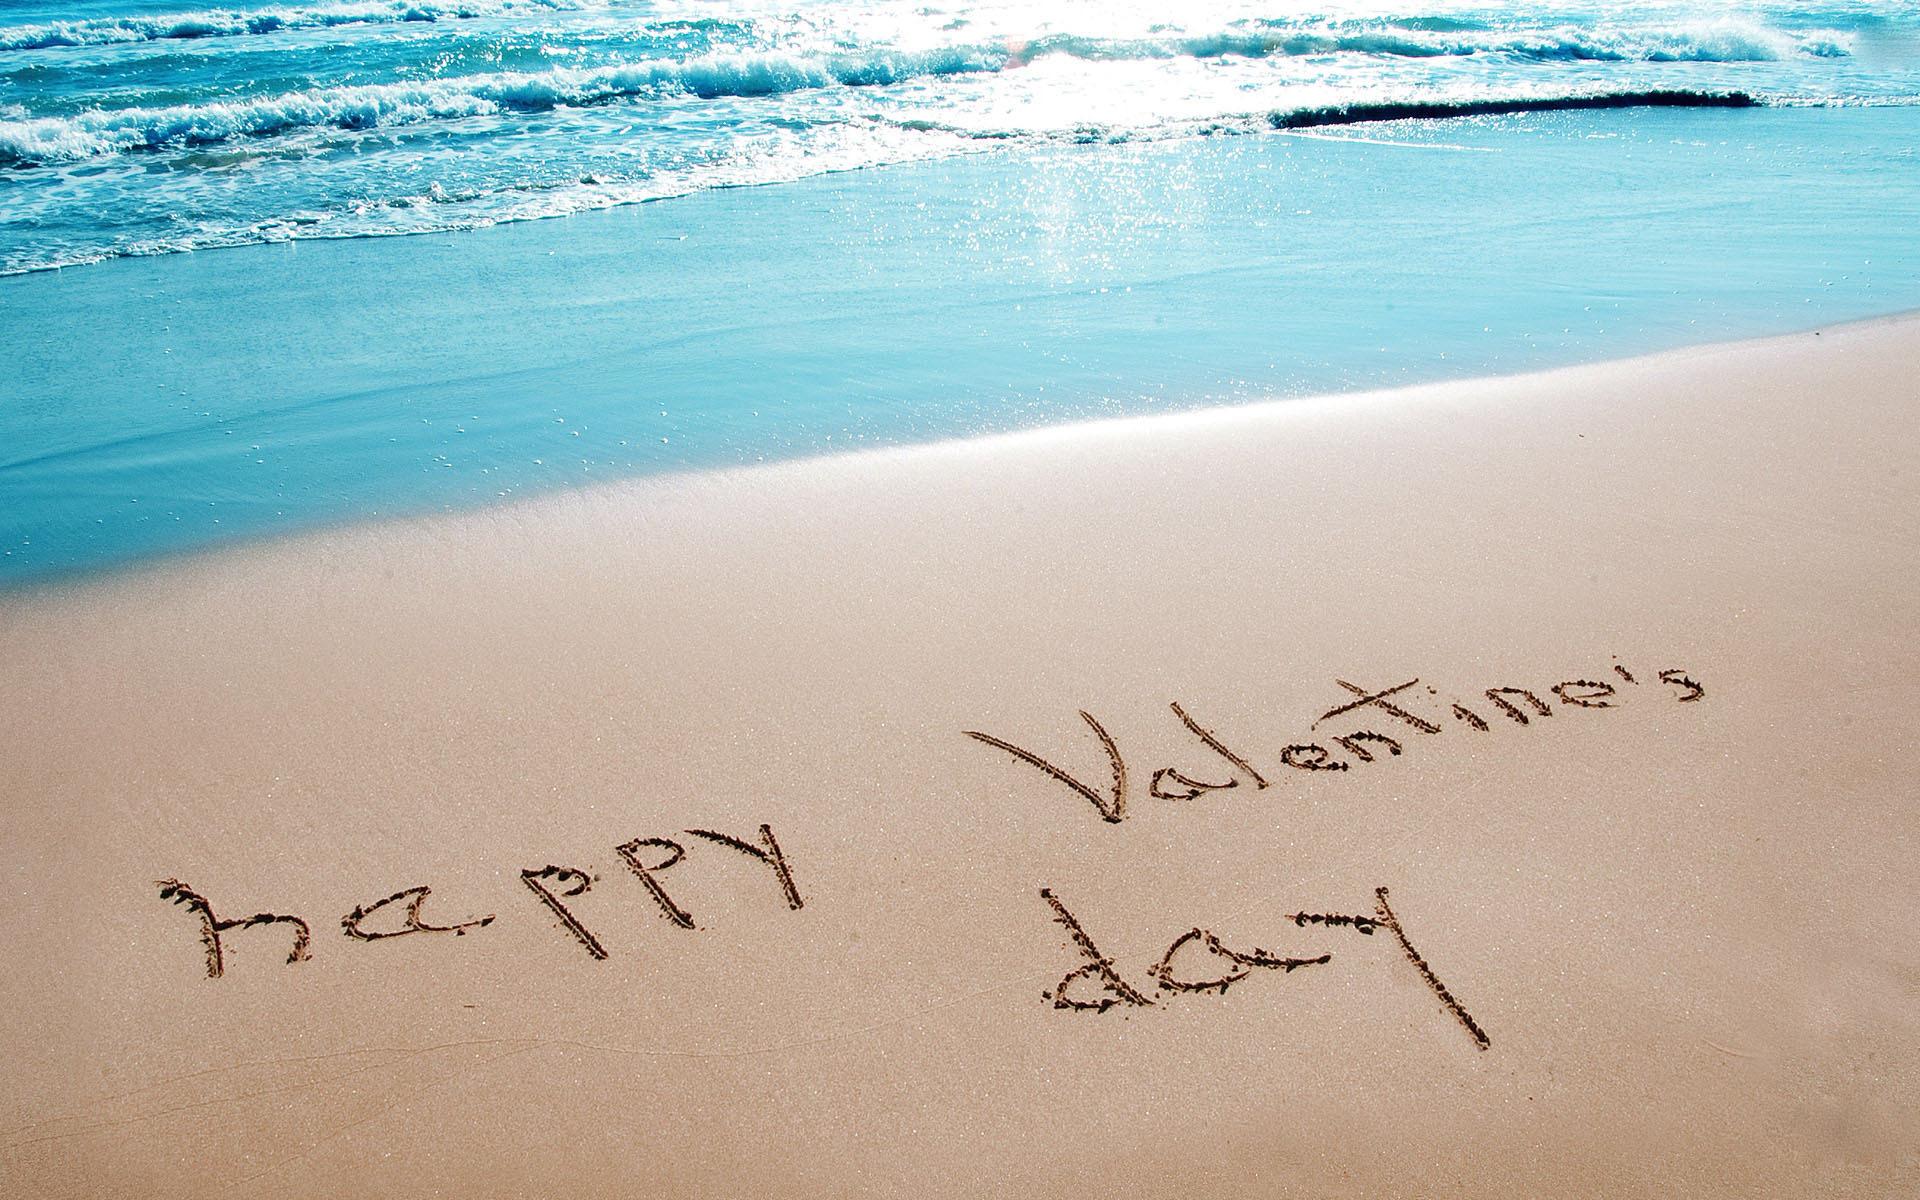 Happy Valentines Day Beach Image 1920x1200